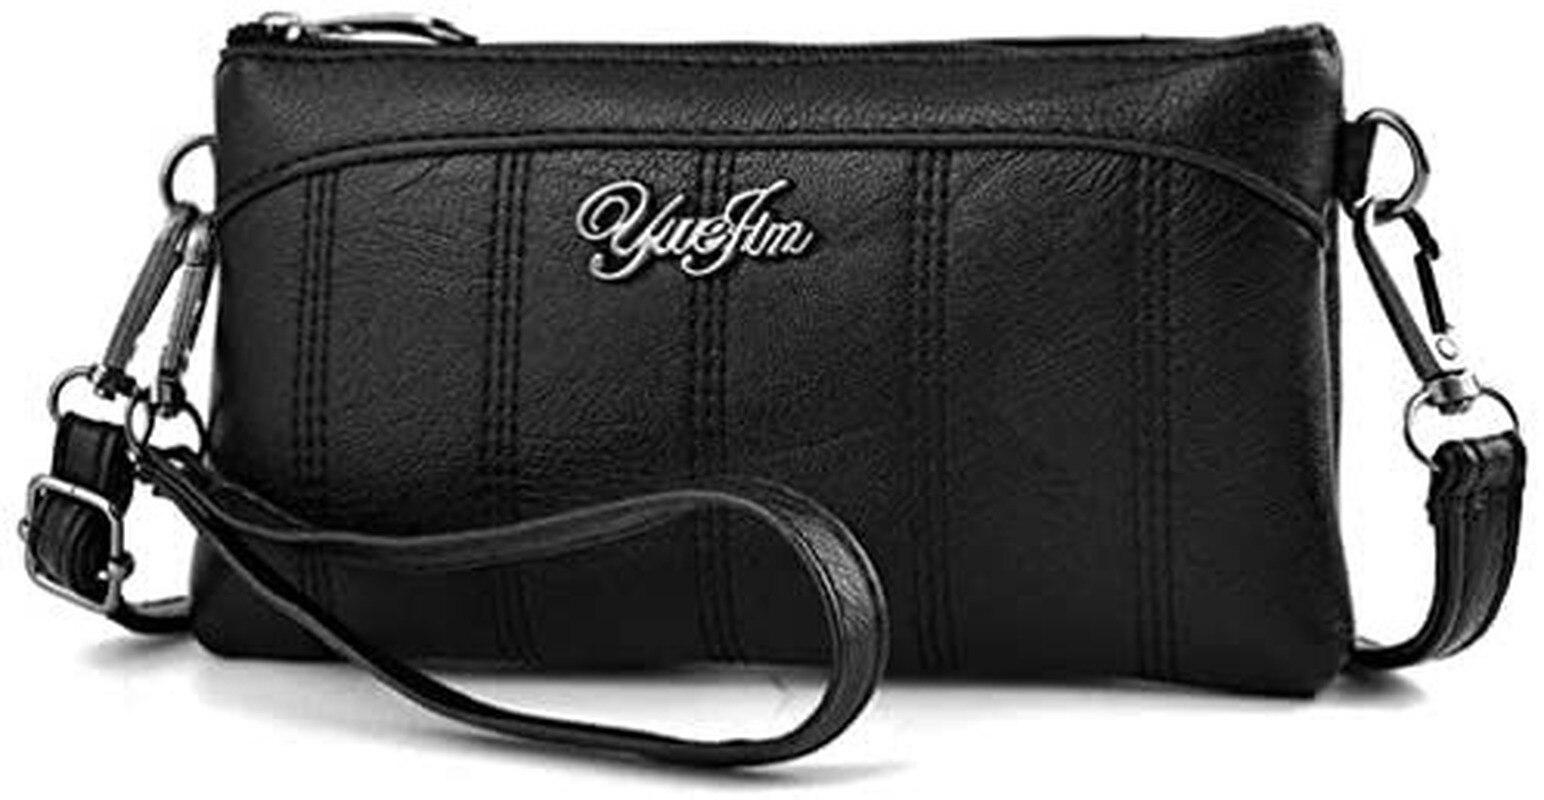 Multifunctional Phone Pouch Bag Purse Multi Pocket Waterproof PU Leather Crossbody Wrist Shoulder Bag for Women Designer Bag